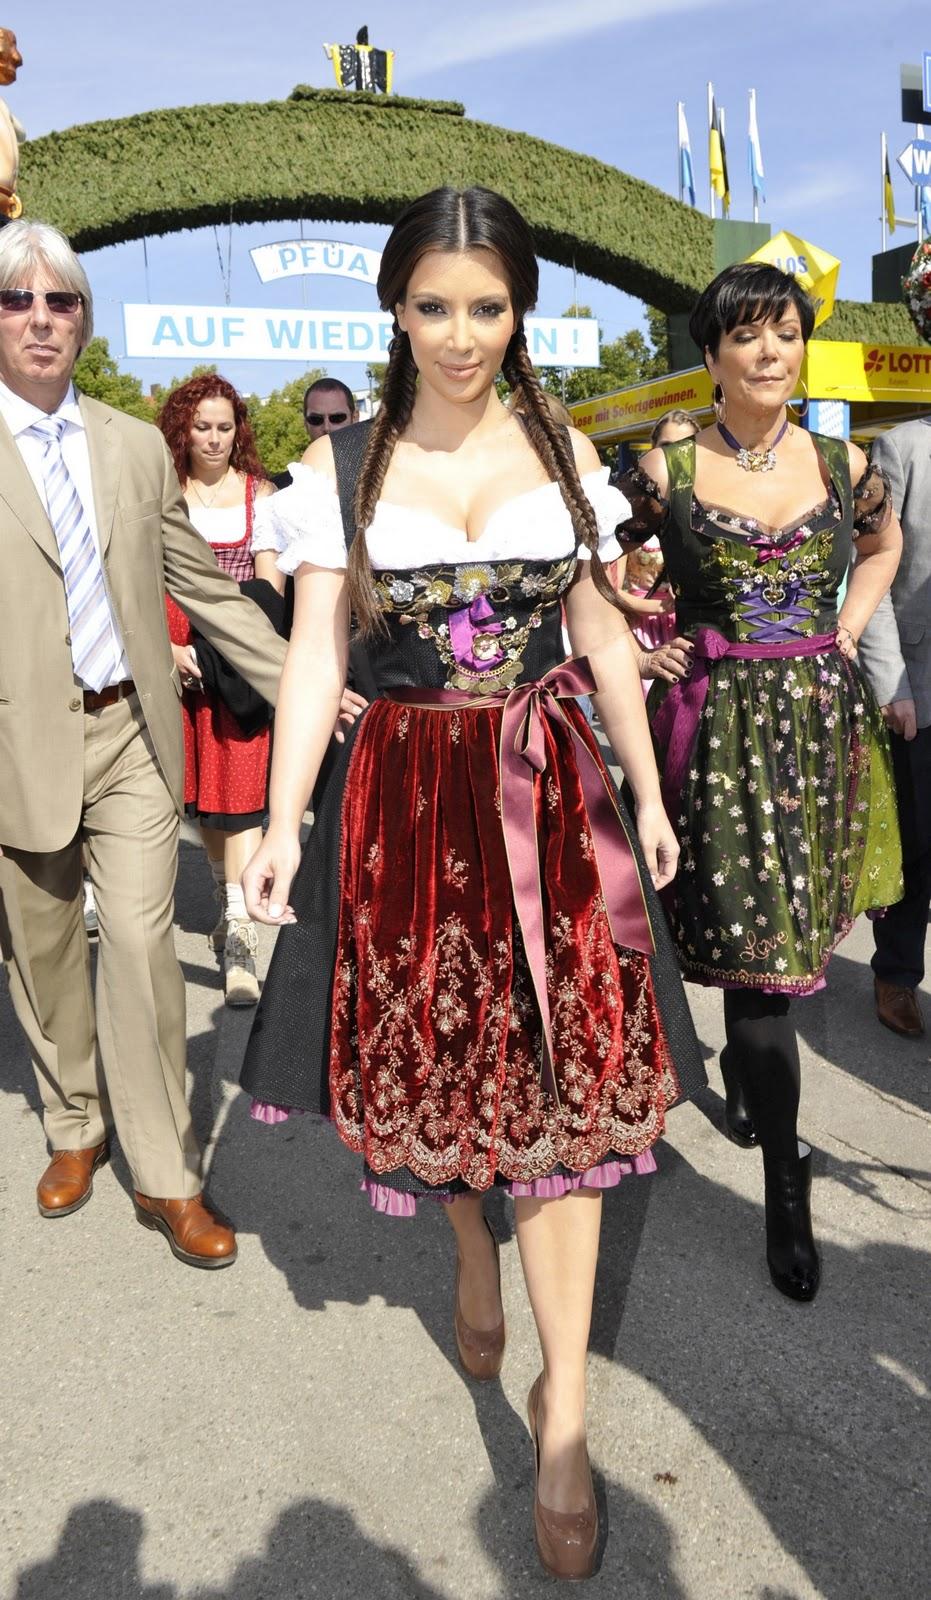 [Kim Kardashian in Munich at Oktoberfest hottest cleavage 10[3].jpg]